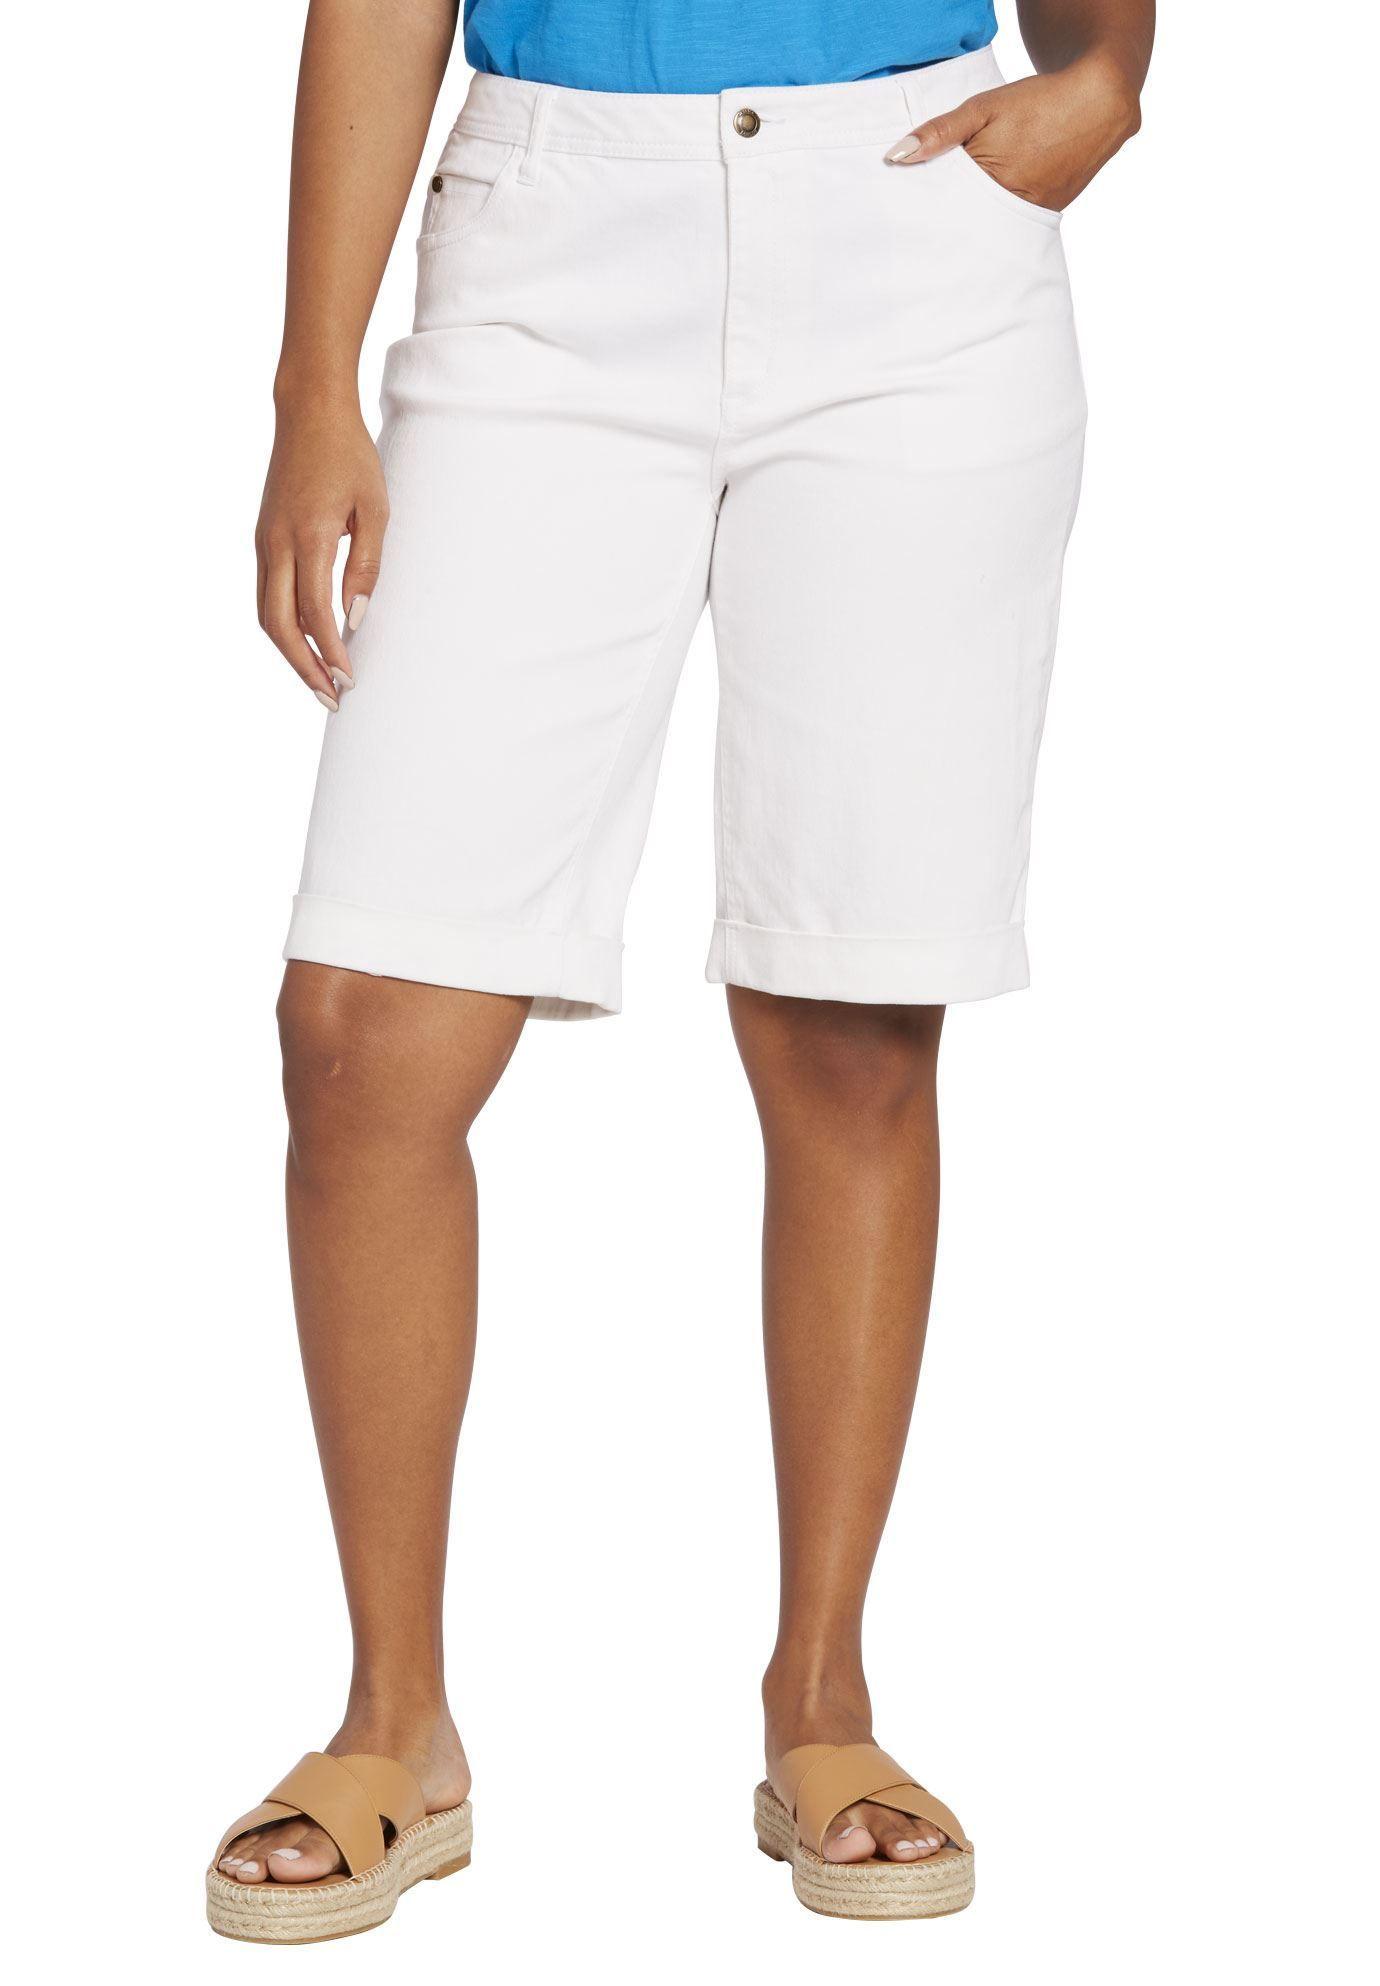 bbd697d4777 Stretch Jean Bermuda Short - Women s Plus Size Clothing